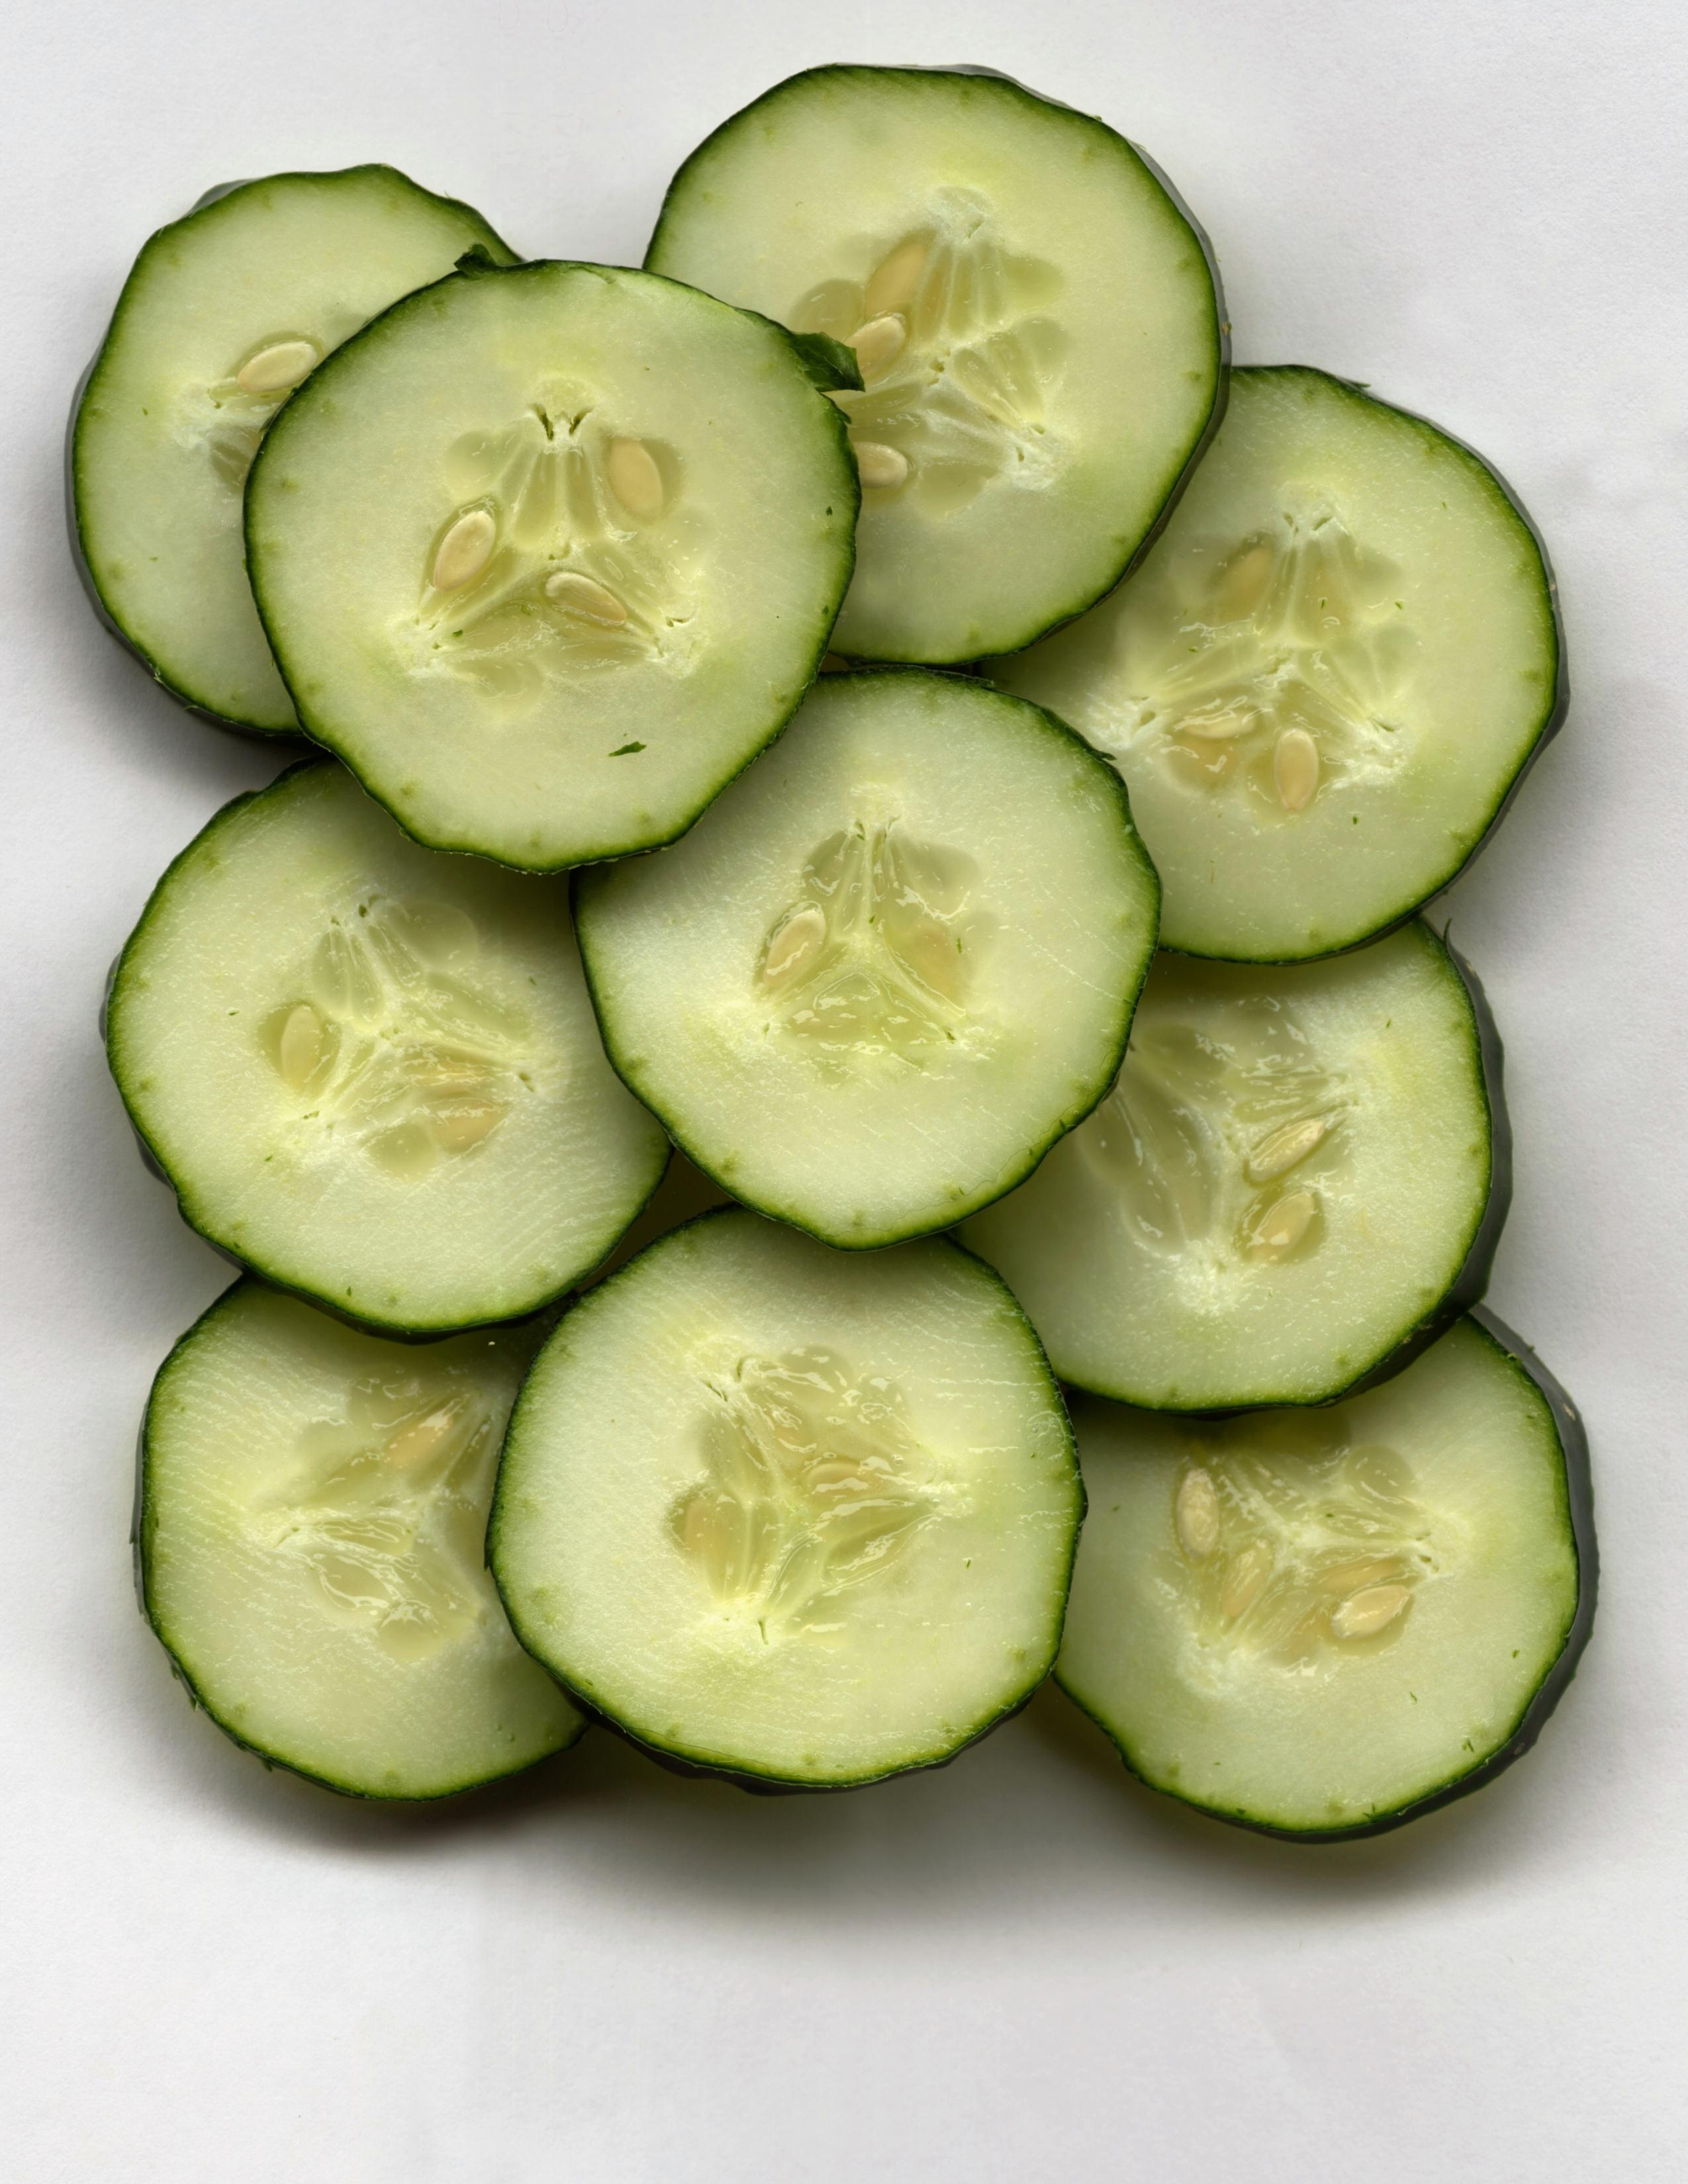 Cucumbers provide moderate amounts of fiber.